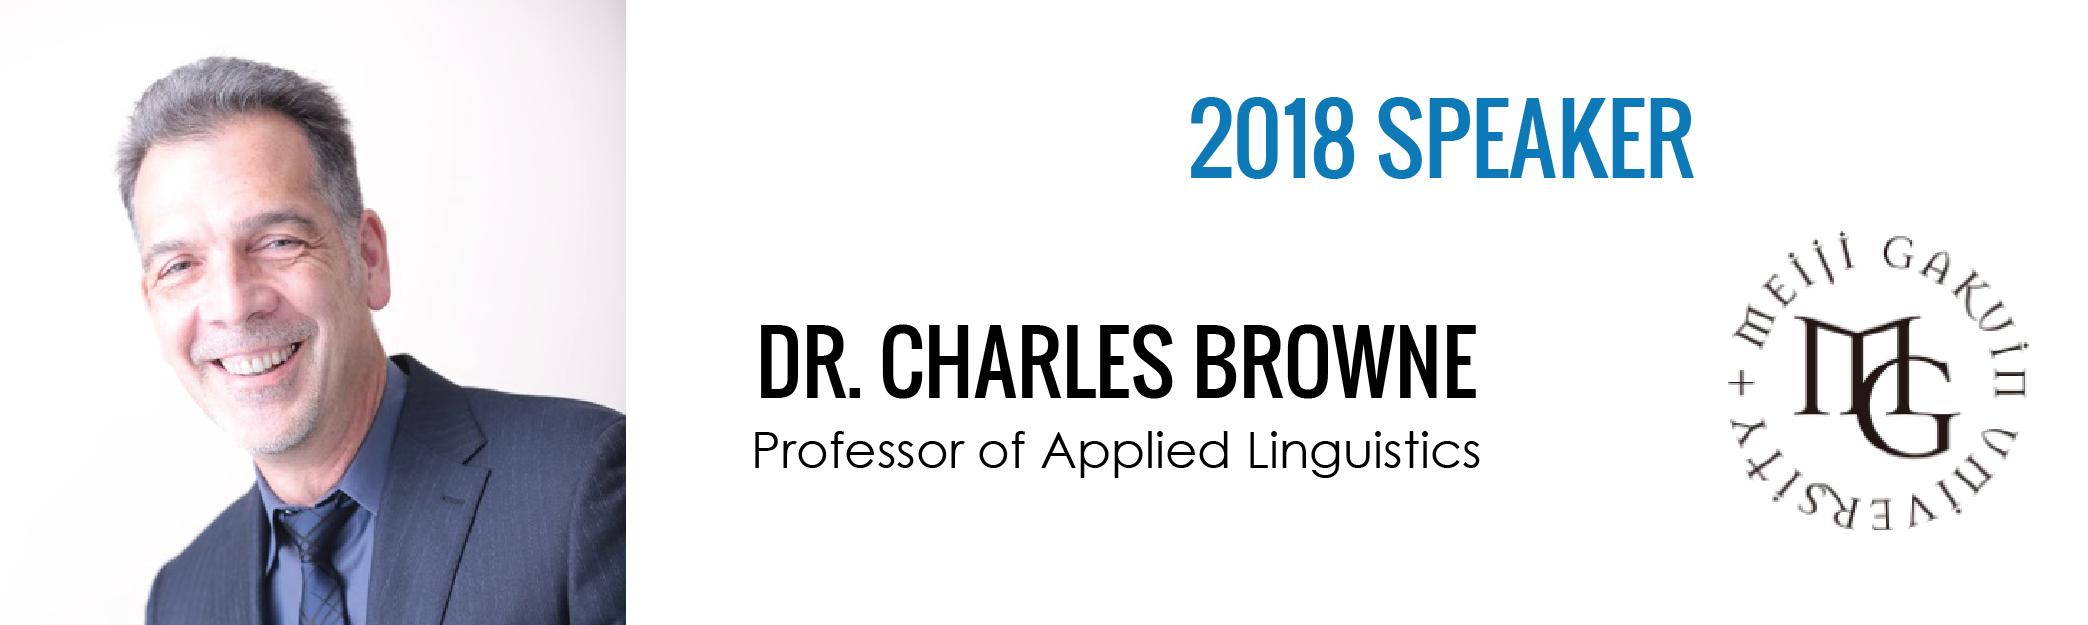 insighthub-MGUni, Dr. Browne